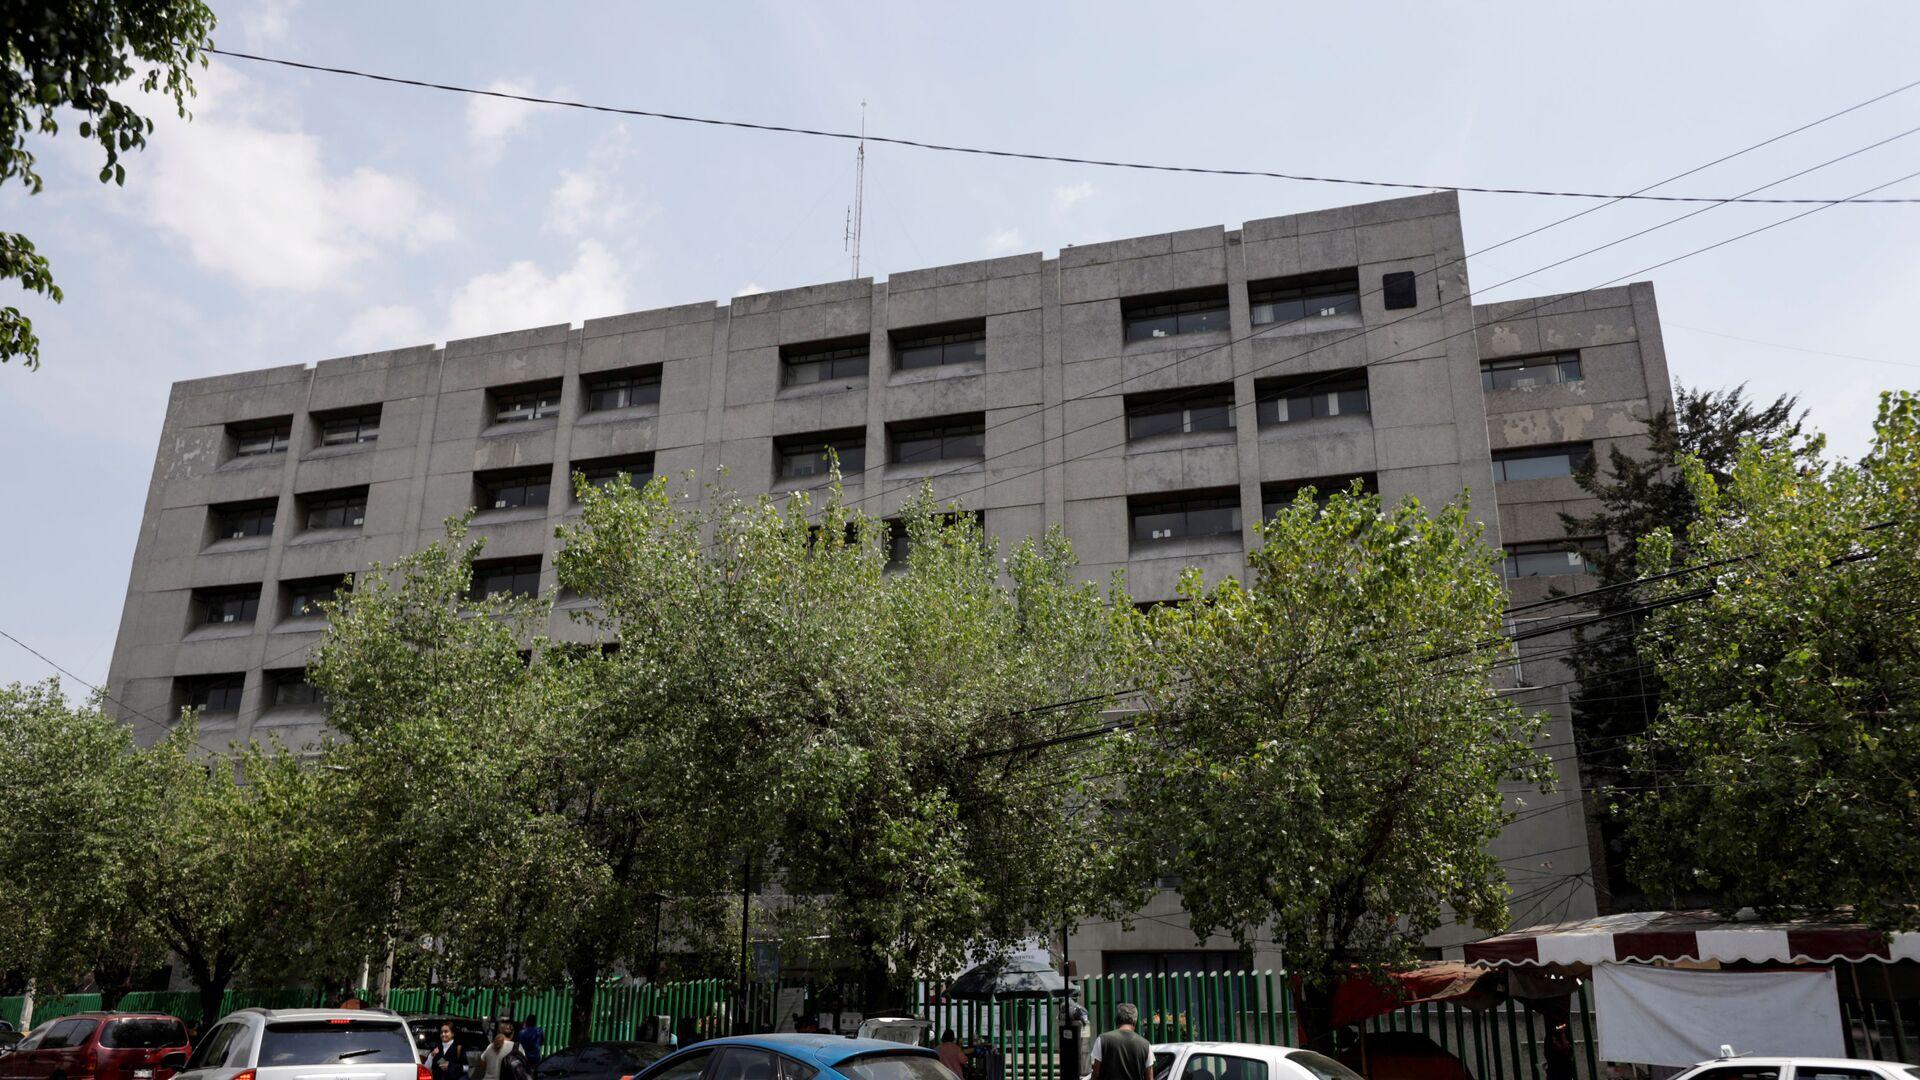 Hospital en México - Sputnik Mundo, 1920, 13.04.2020